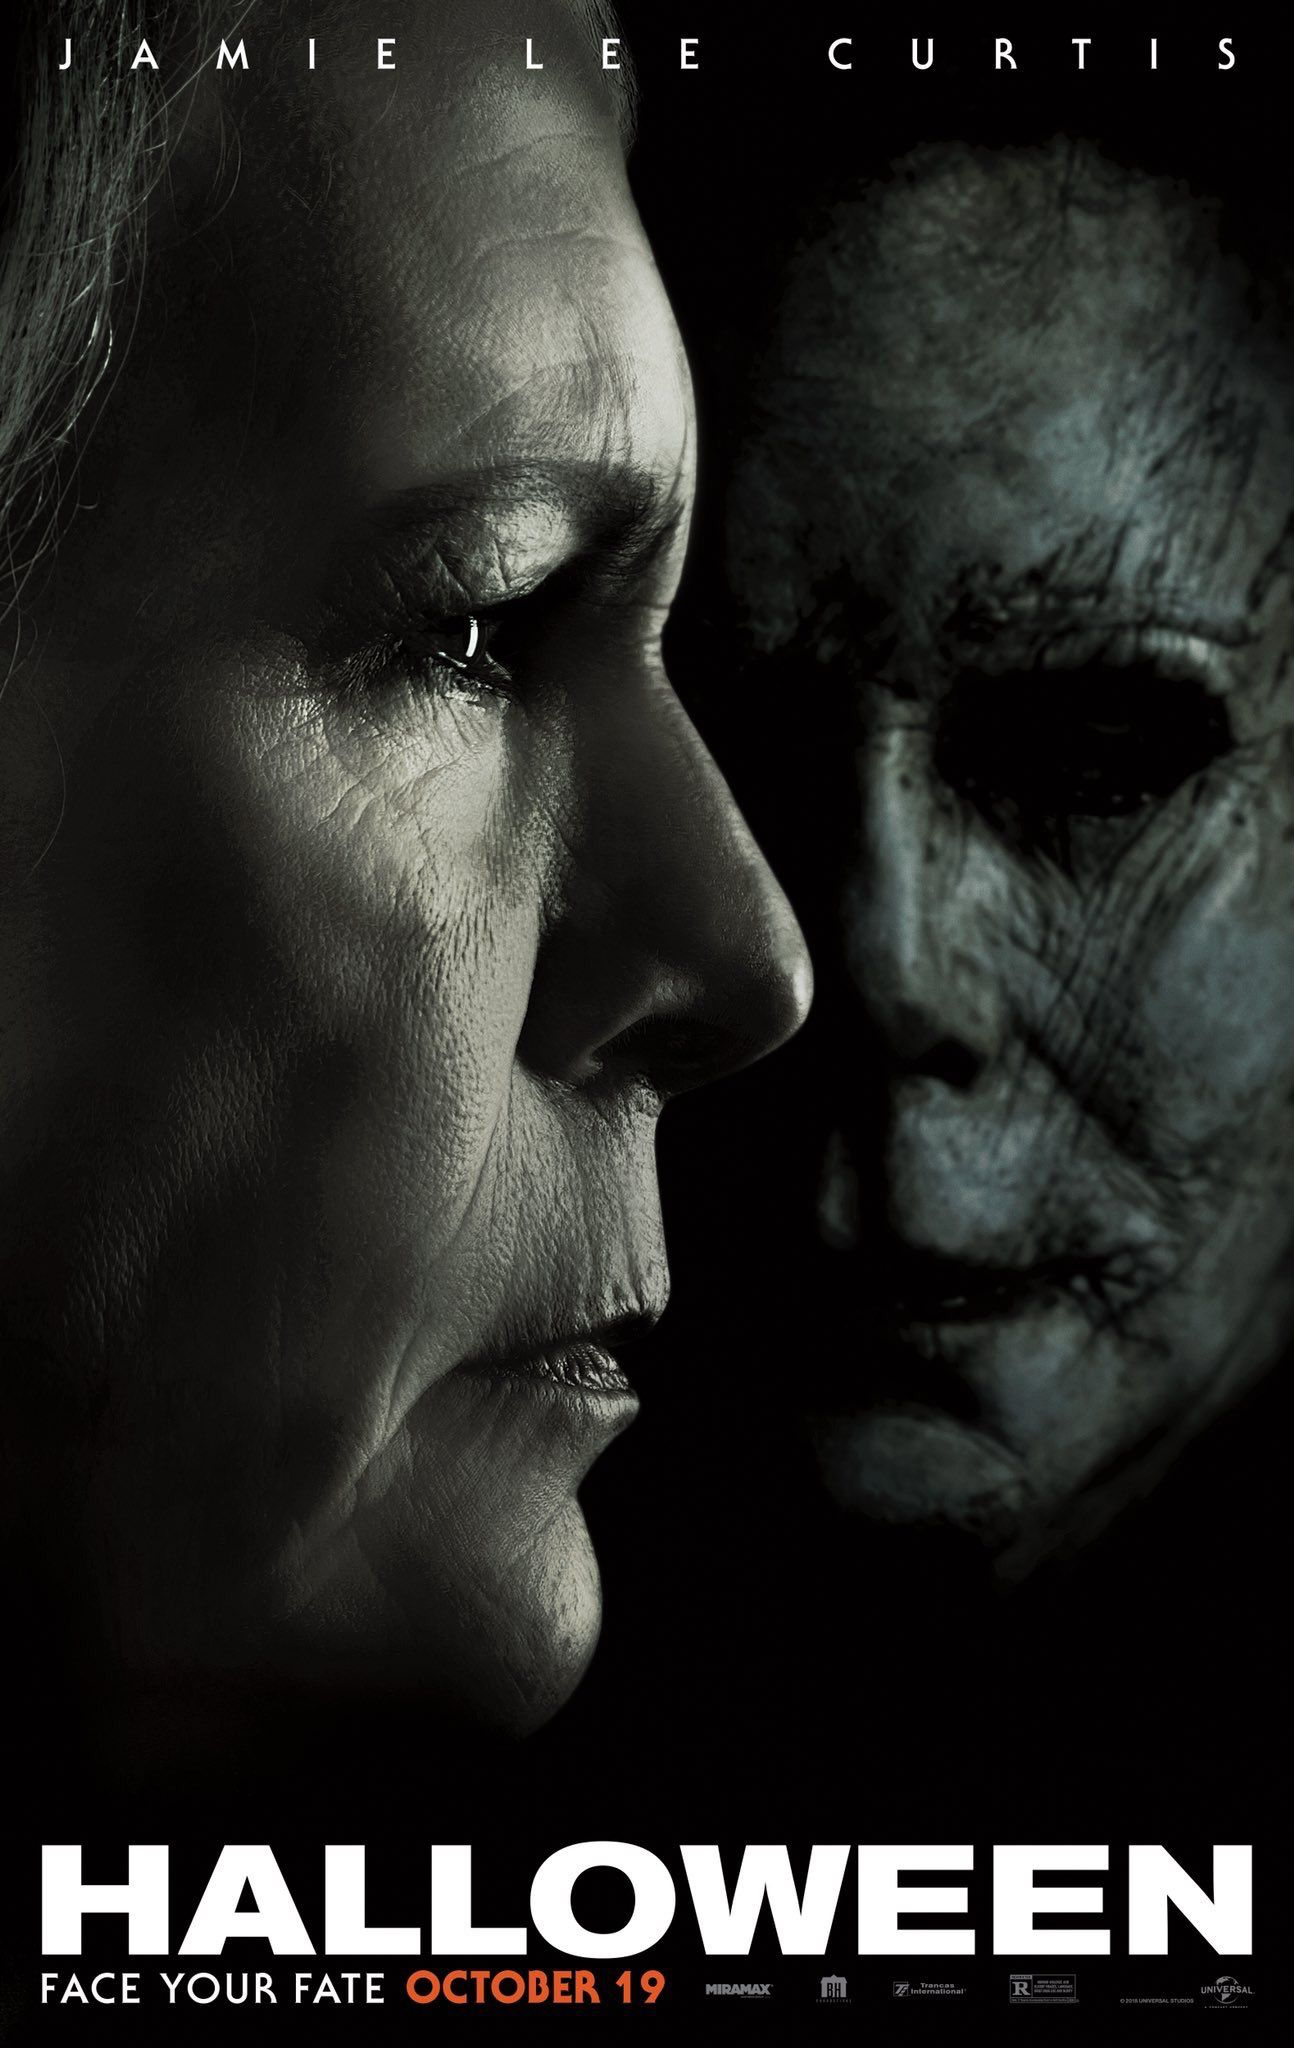 Pin by Jeff Owens on Halloween (Movies) Halloween film